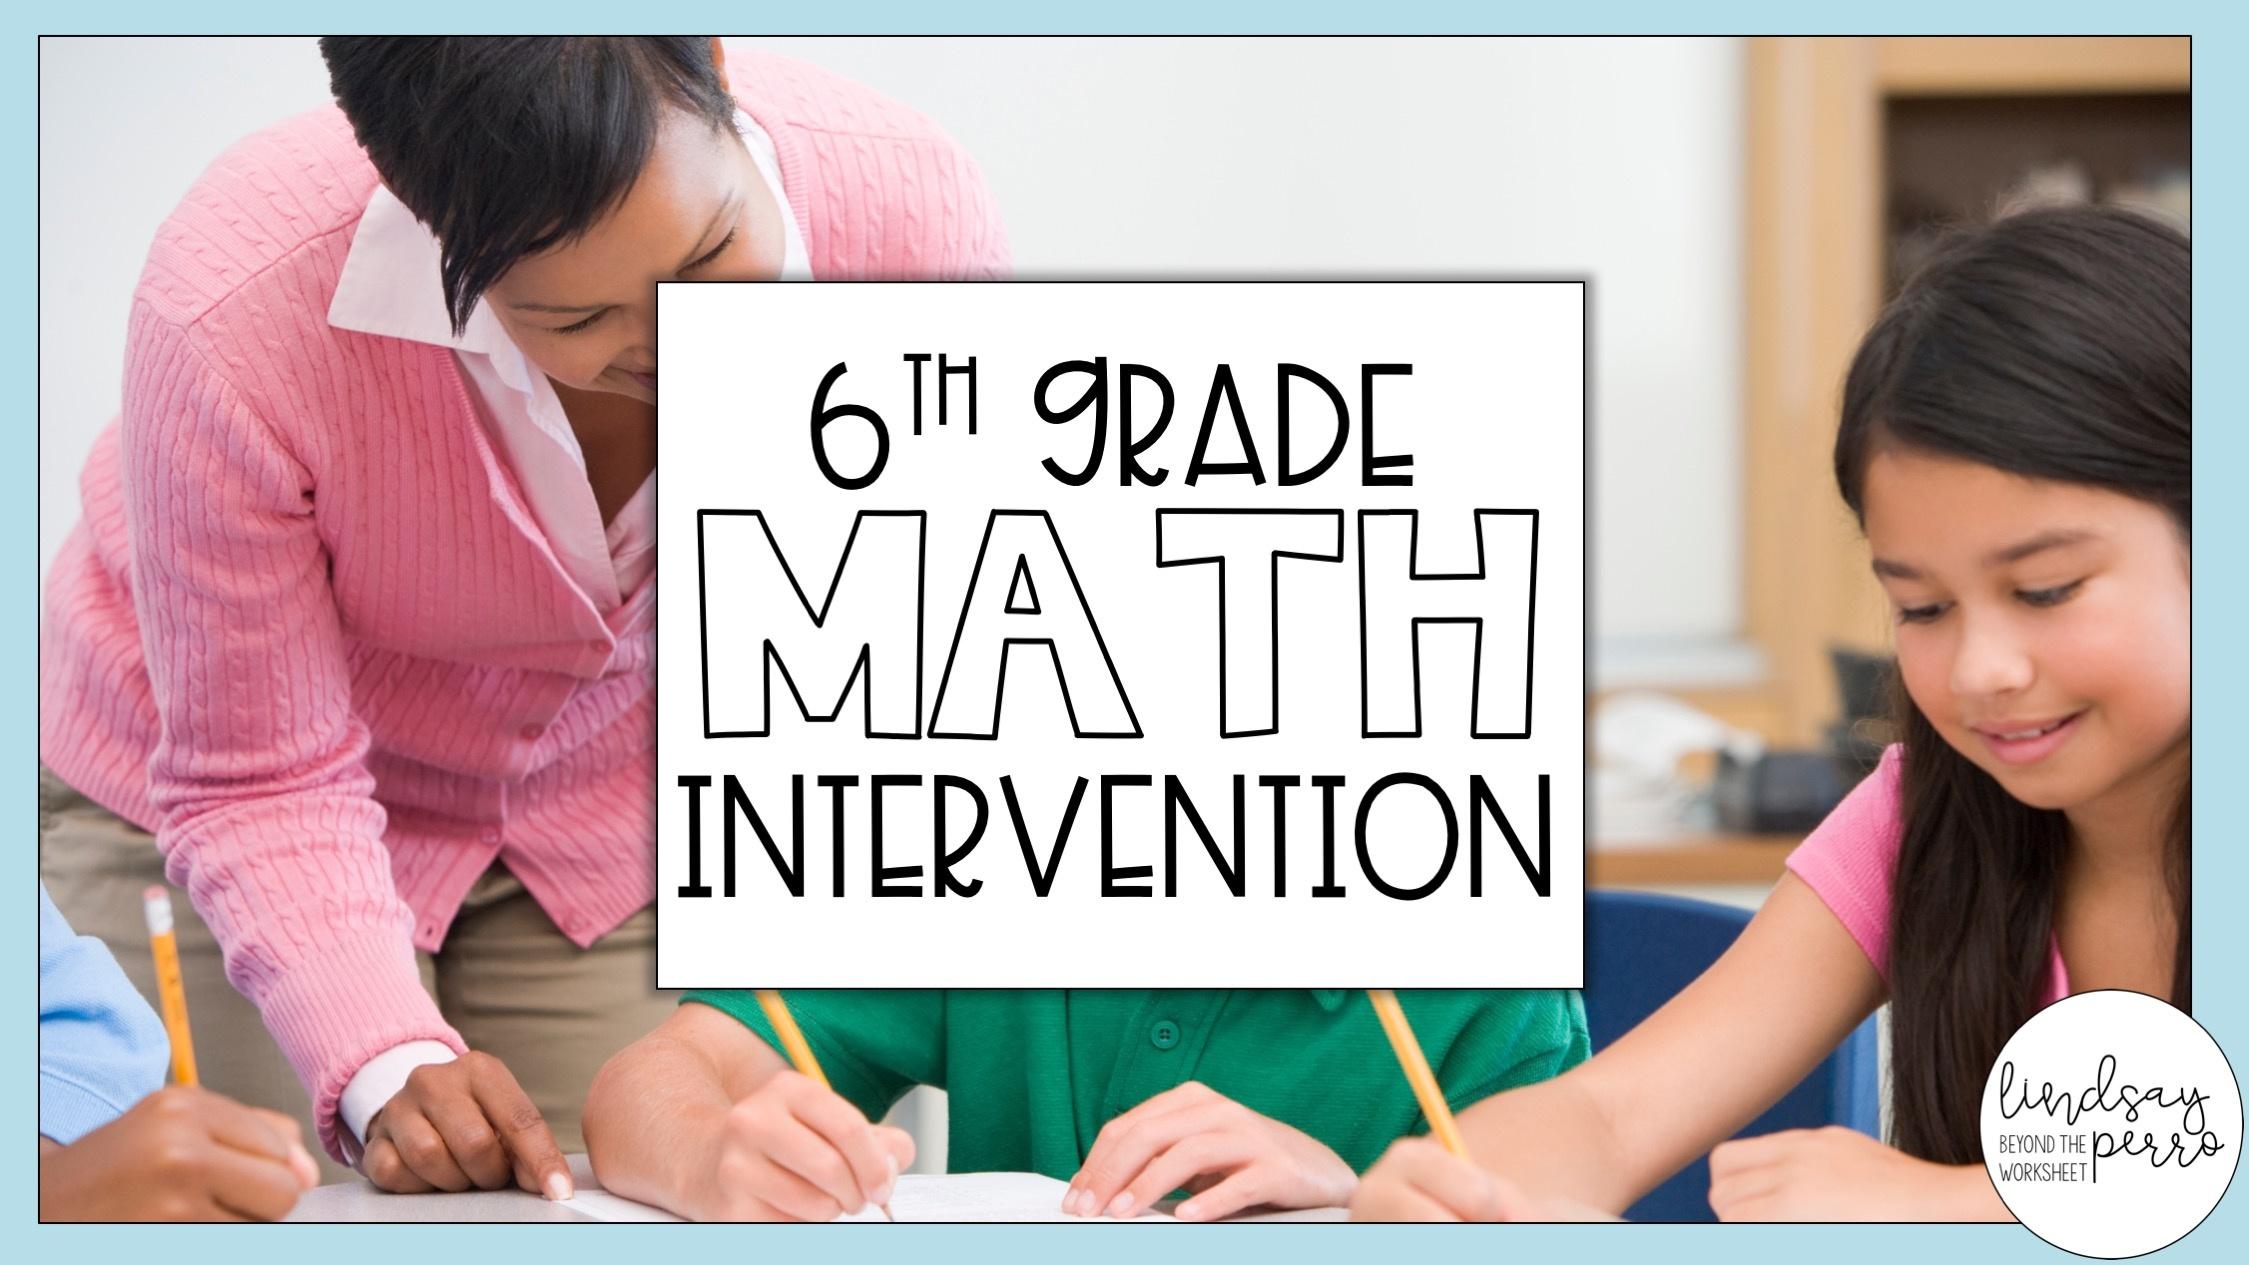 6th Grade Math Intervention